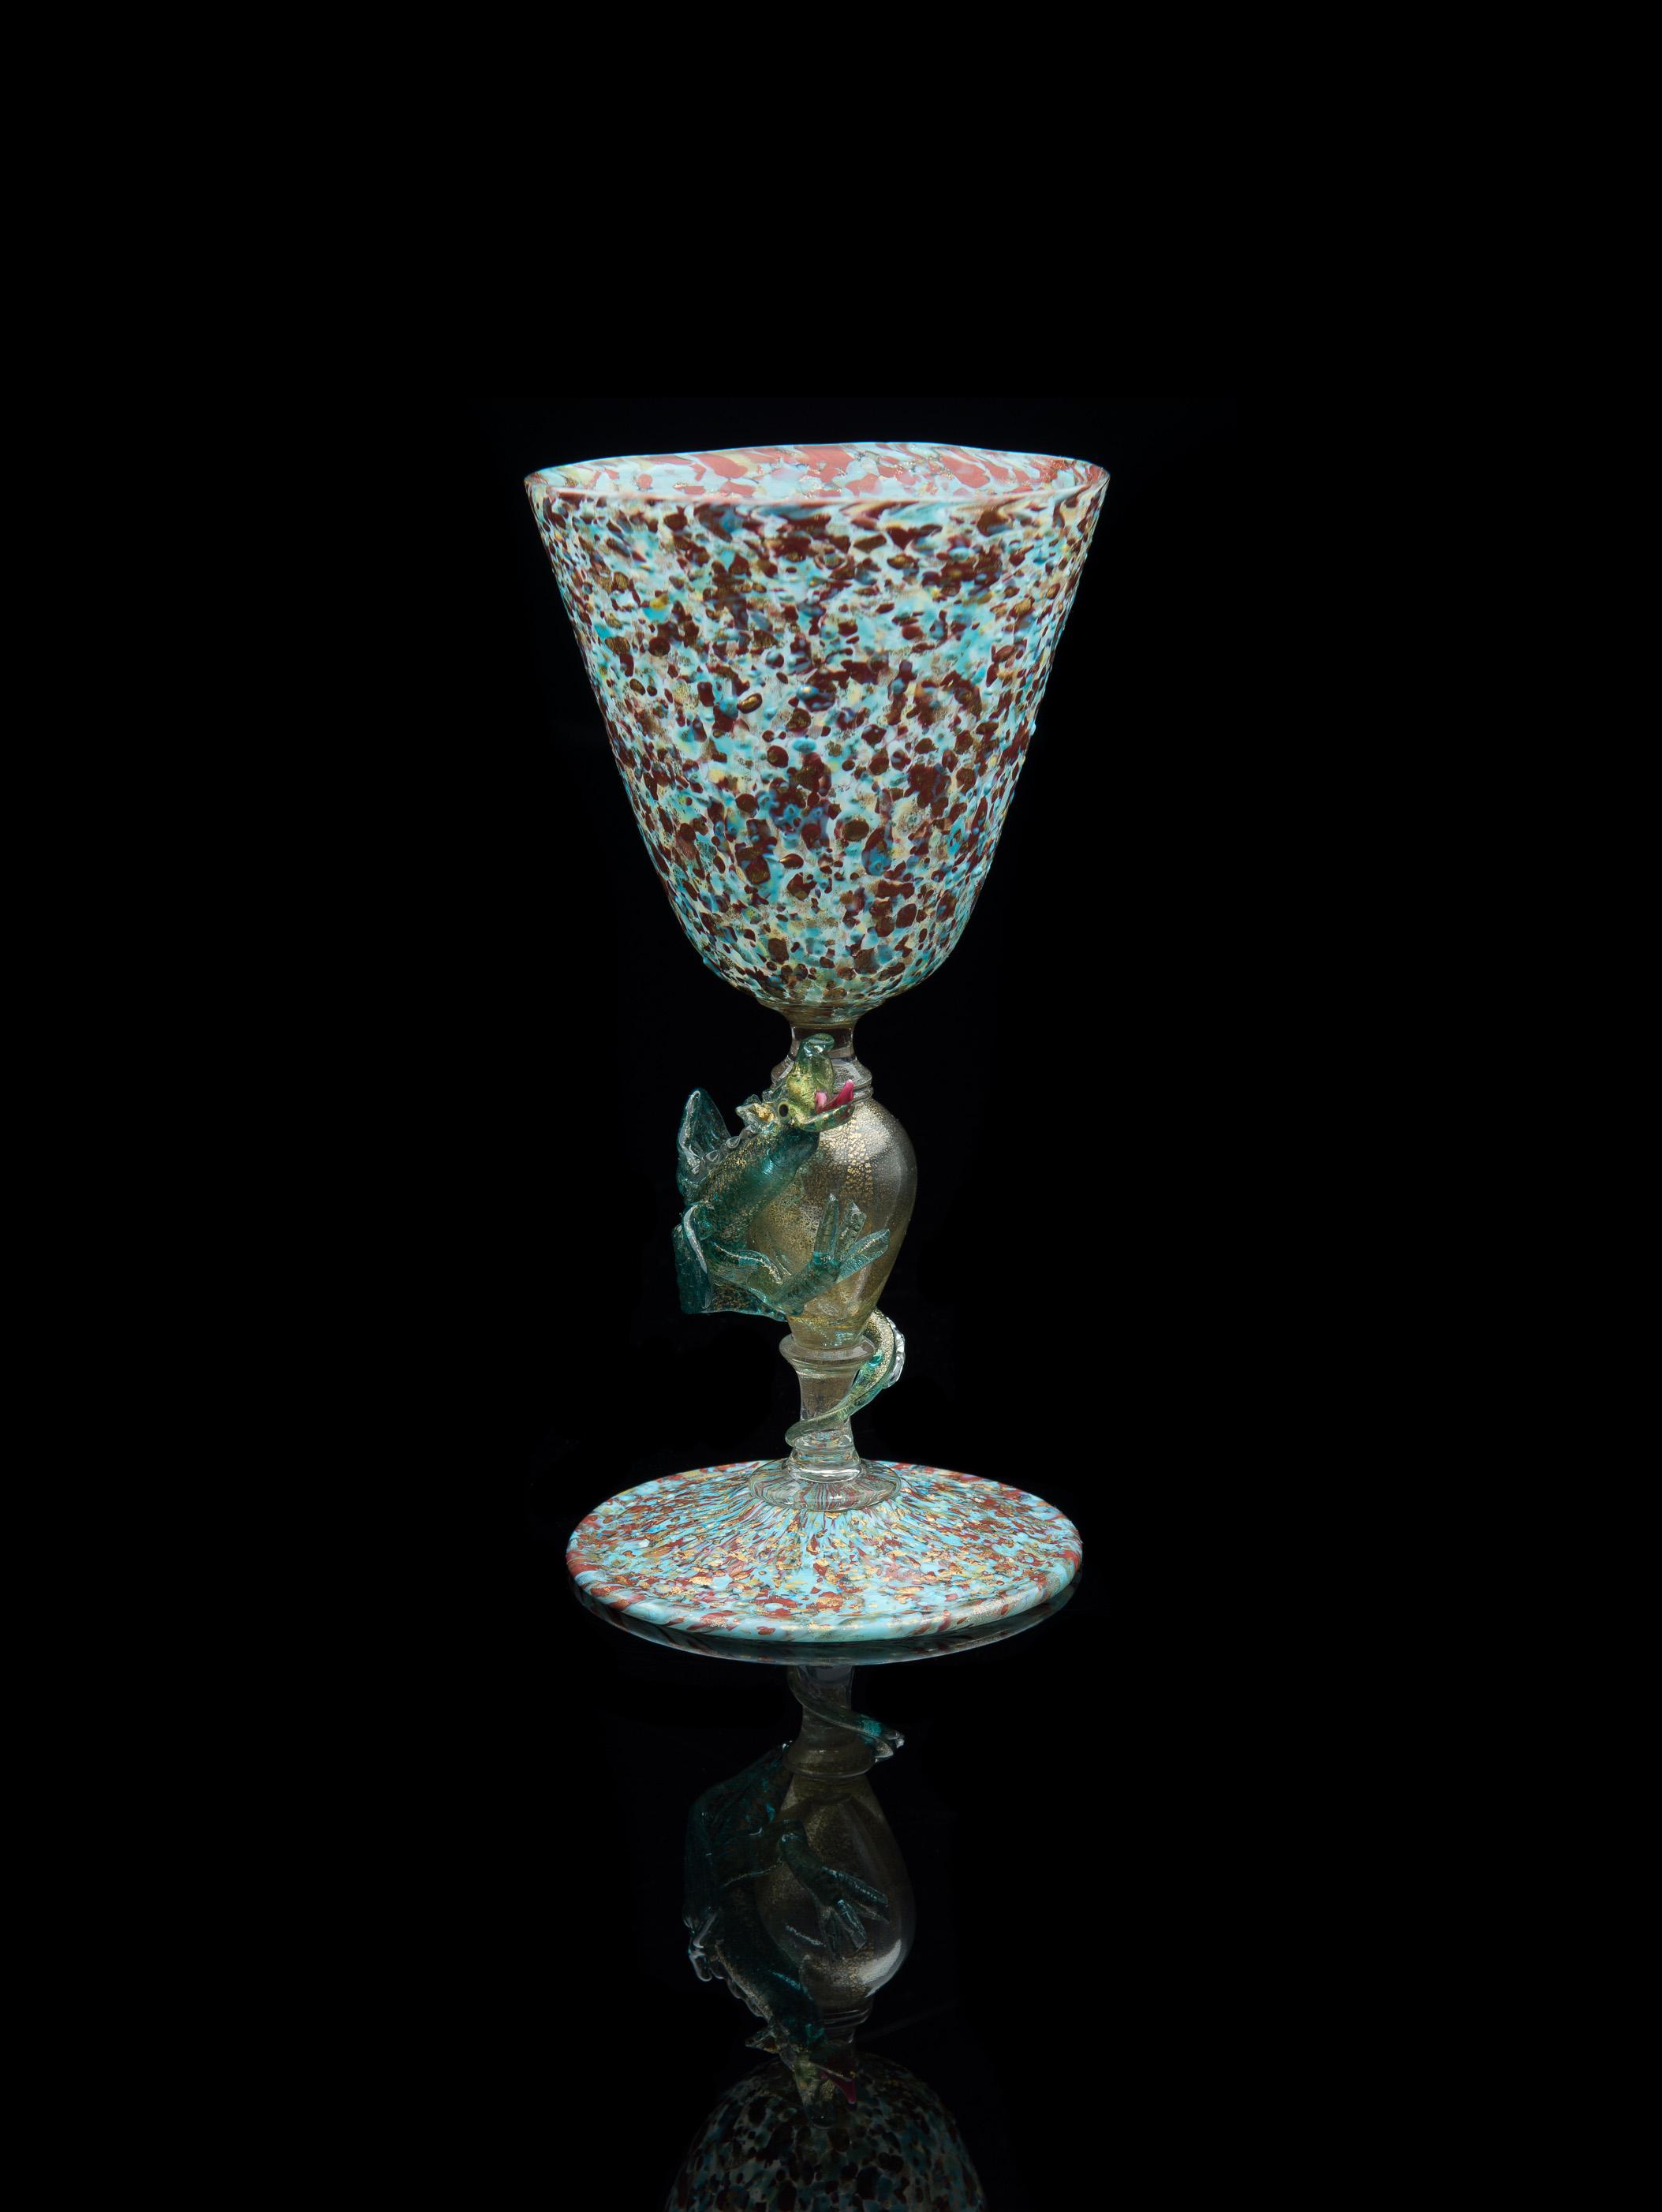 Salviati and Company, Descreziato Dragon Stem Goblet (glass), VV.401